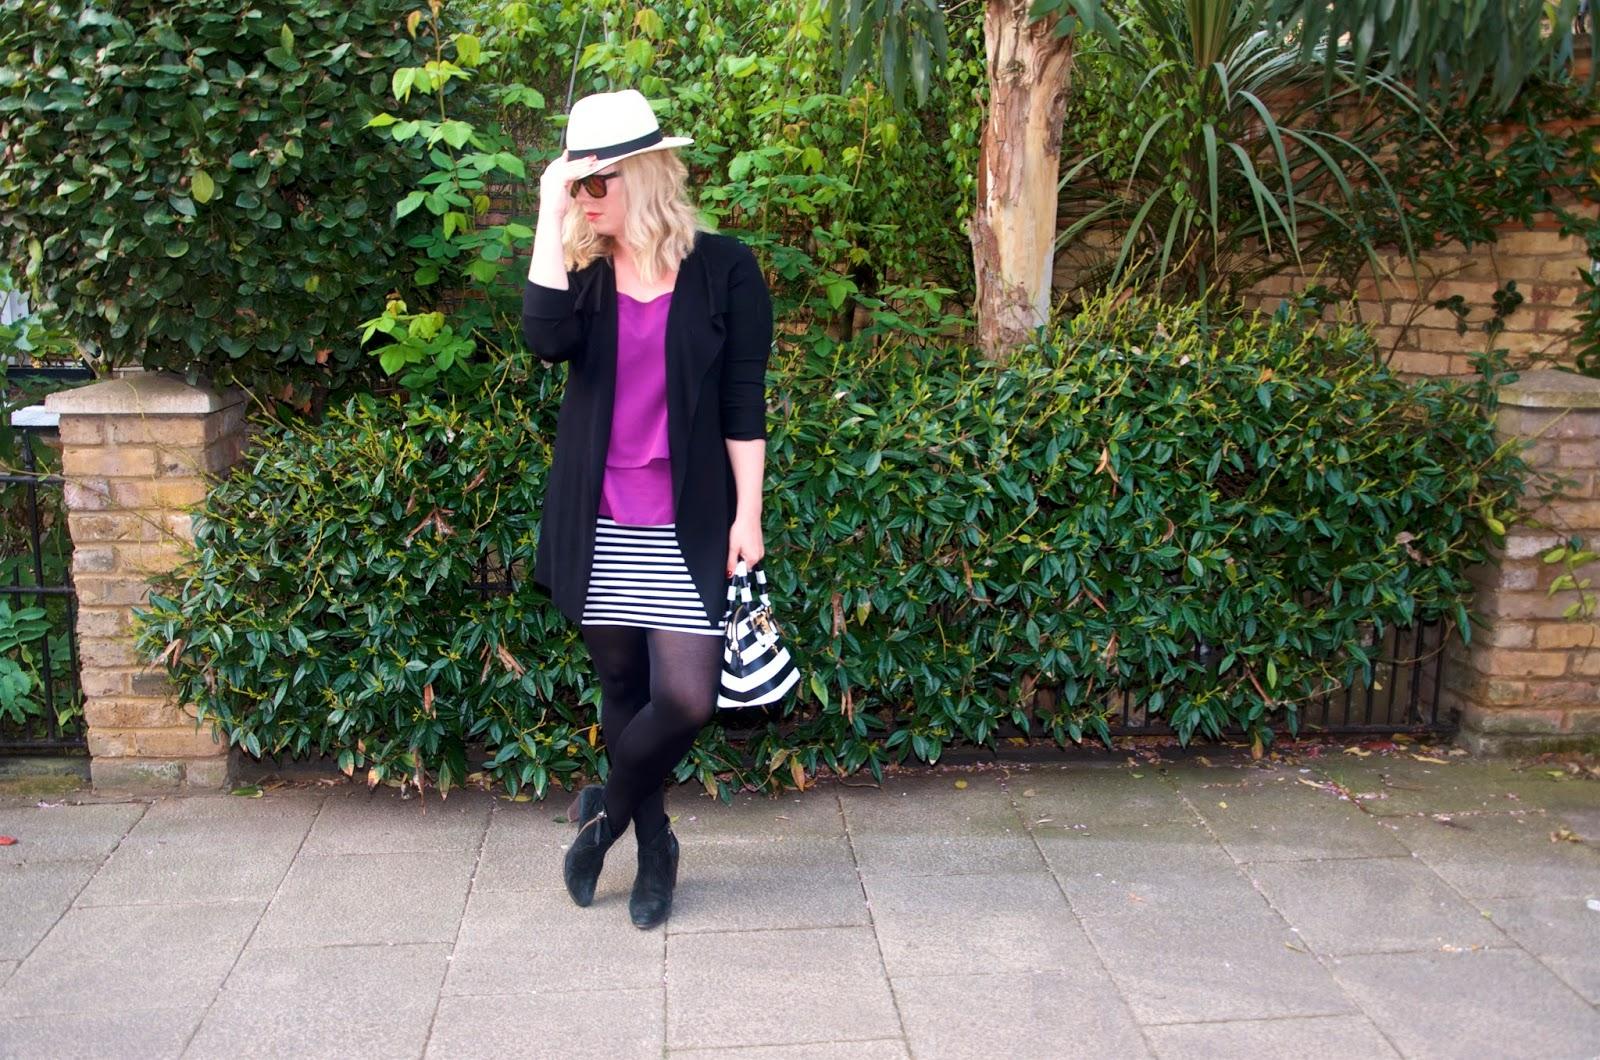 Fuchsia top, striped skirt, striped bag, fedora, tights, suede boots, black cardigan, mirror sunglasses